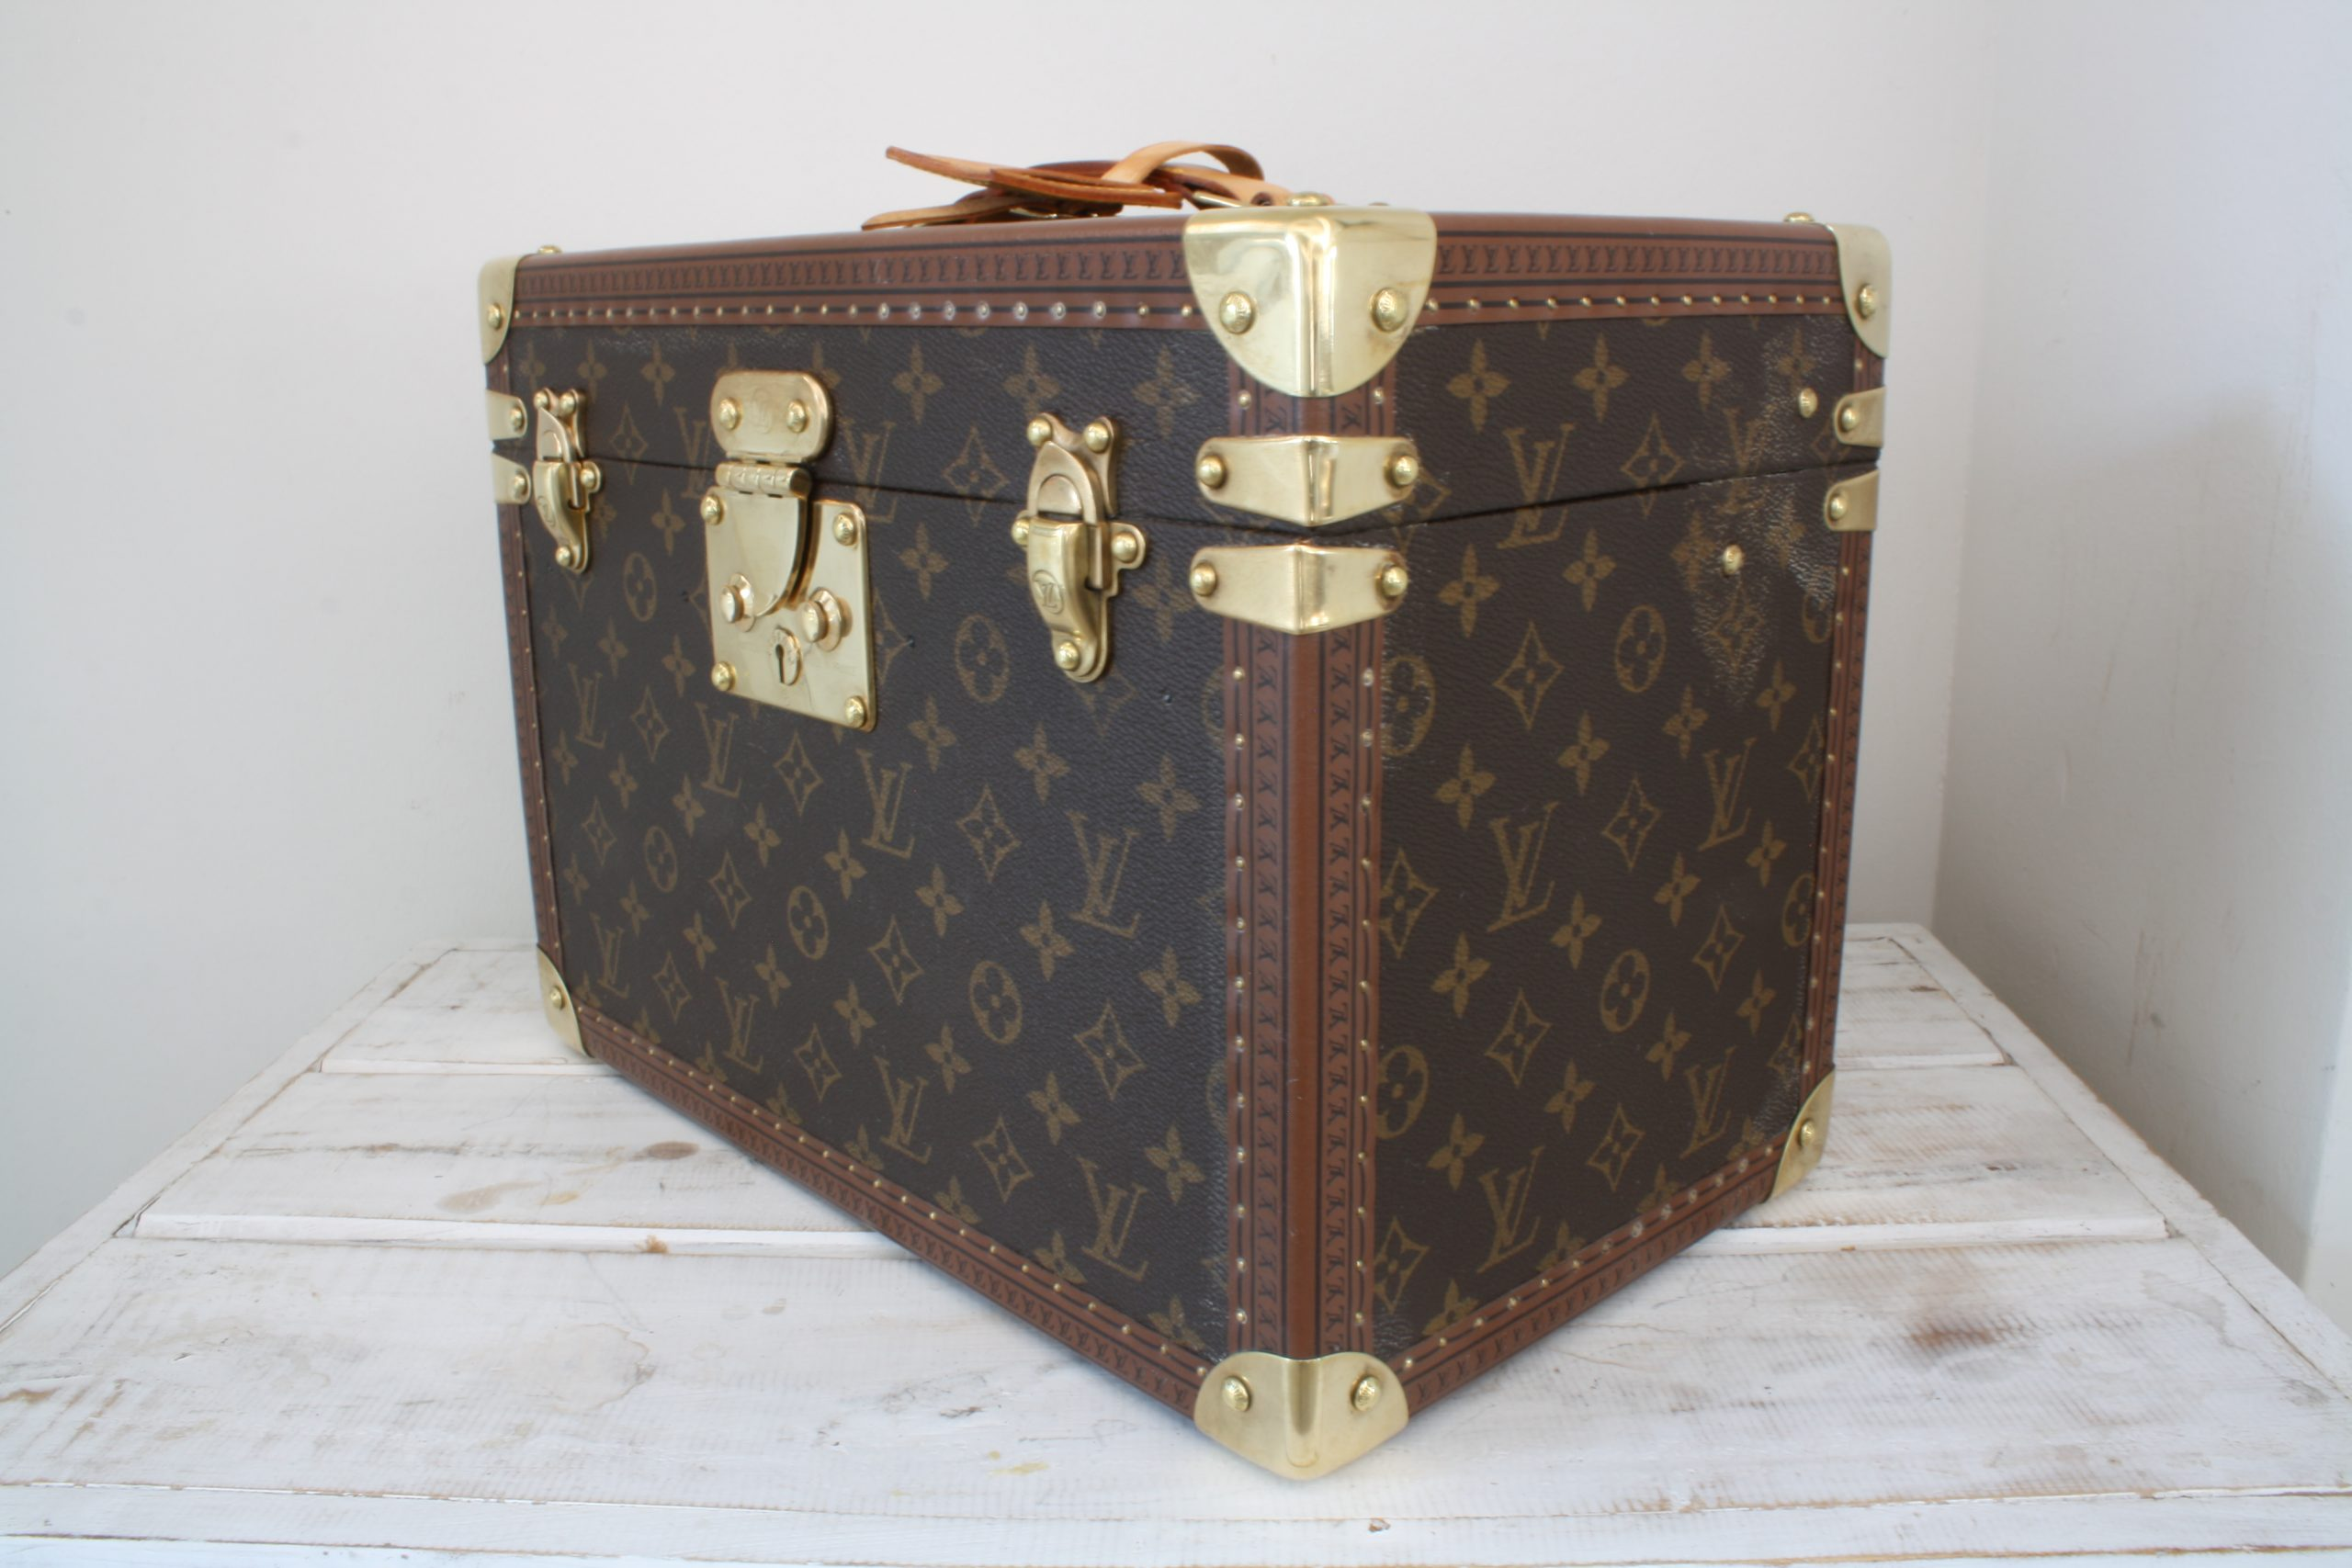 vintage-louis-vuitton-large-vanity-case-side-right-front